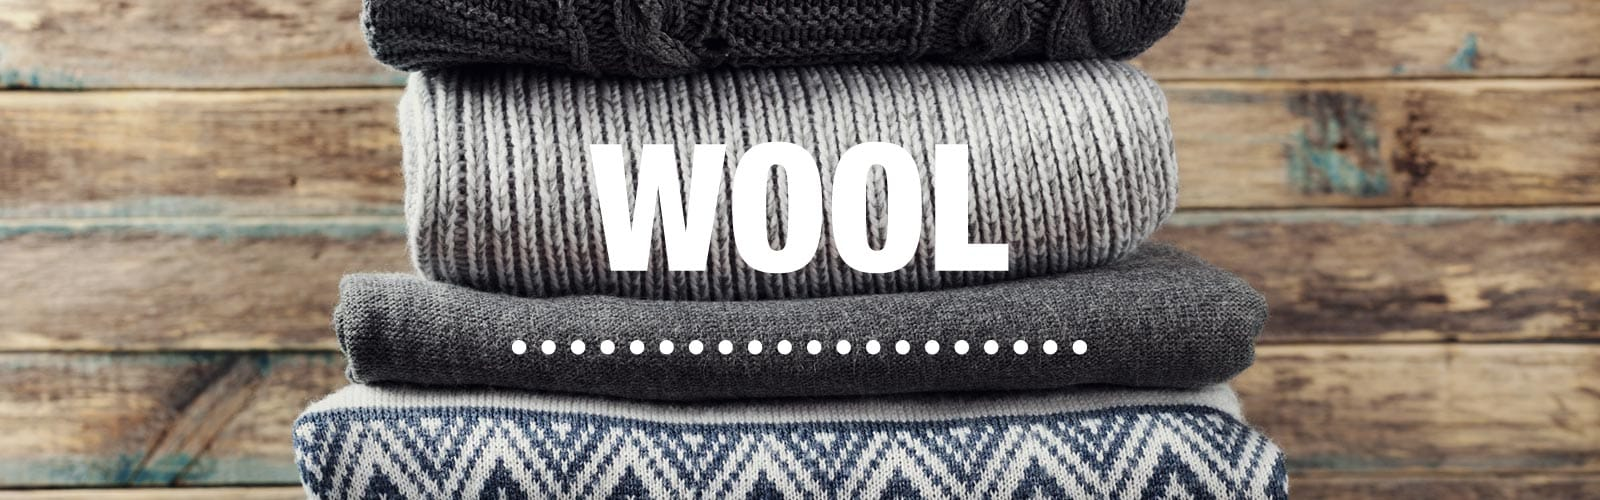 Wool Guide